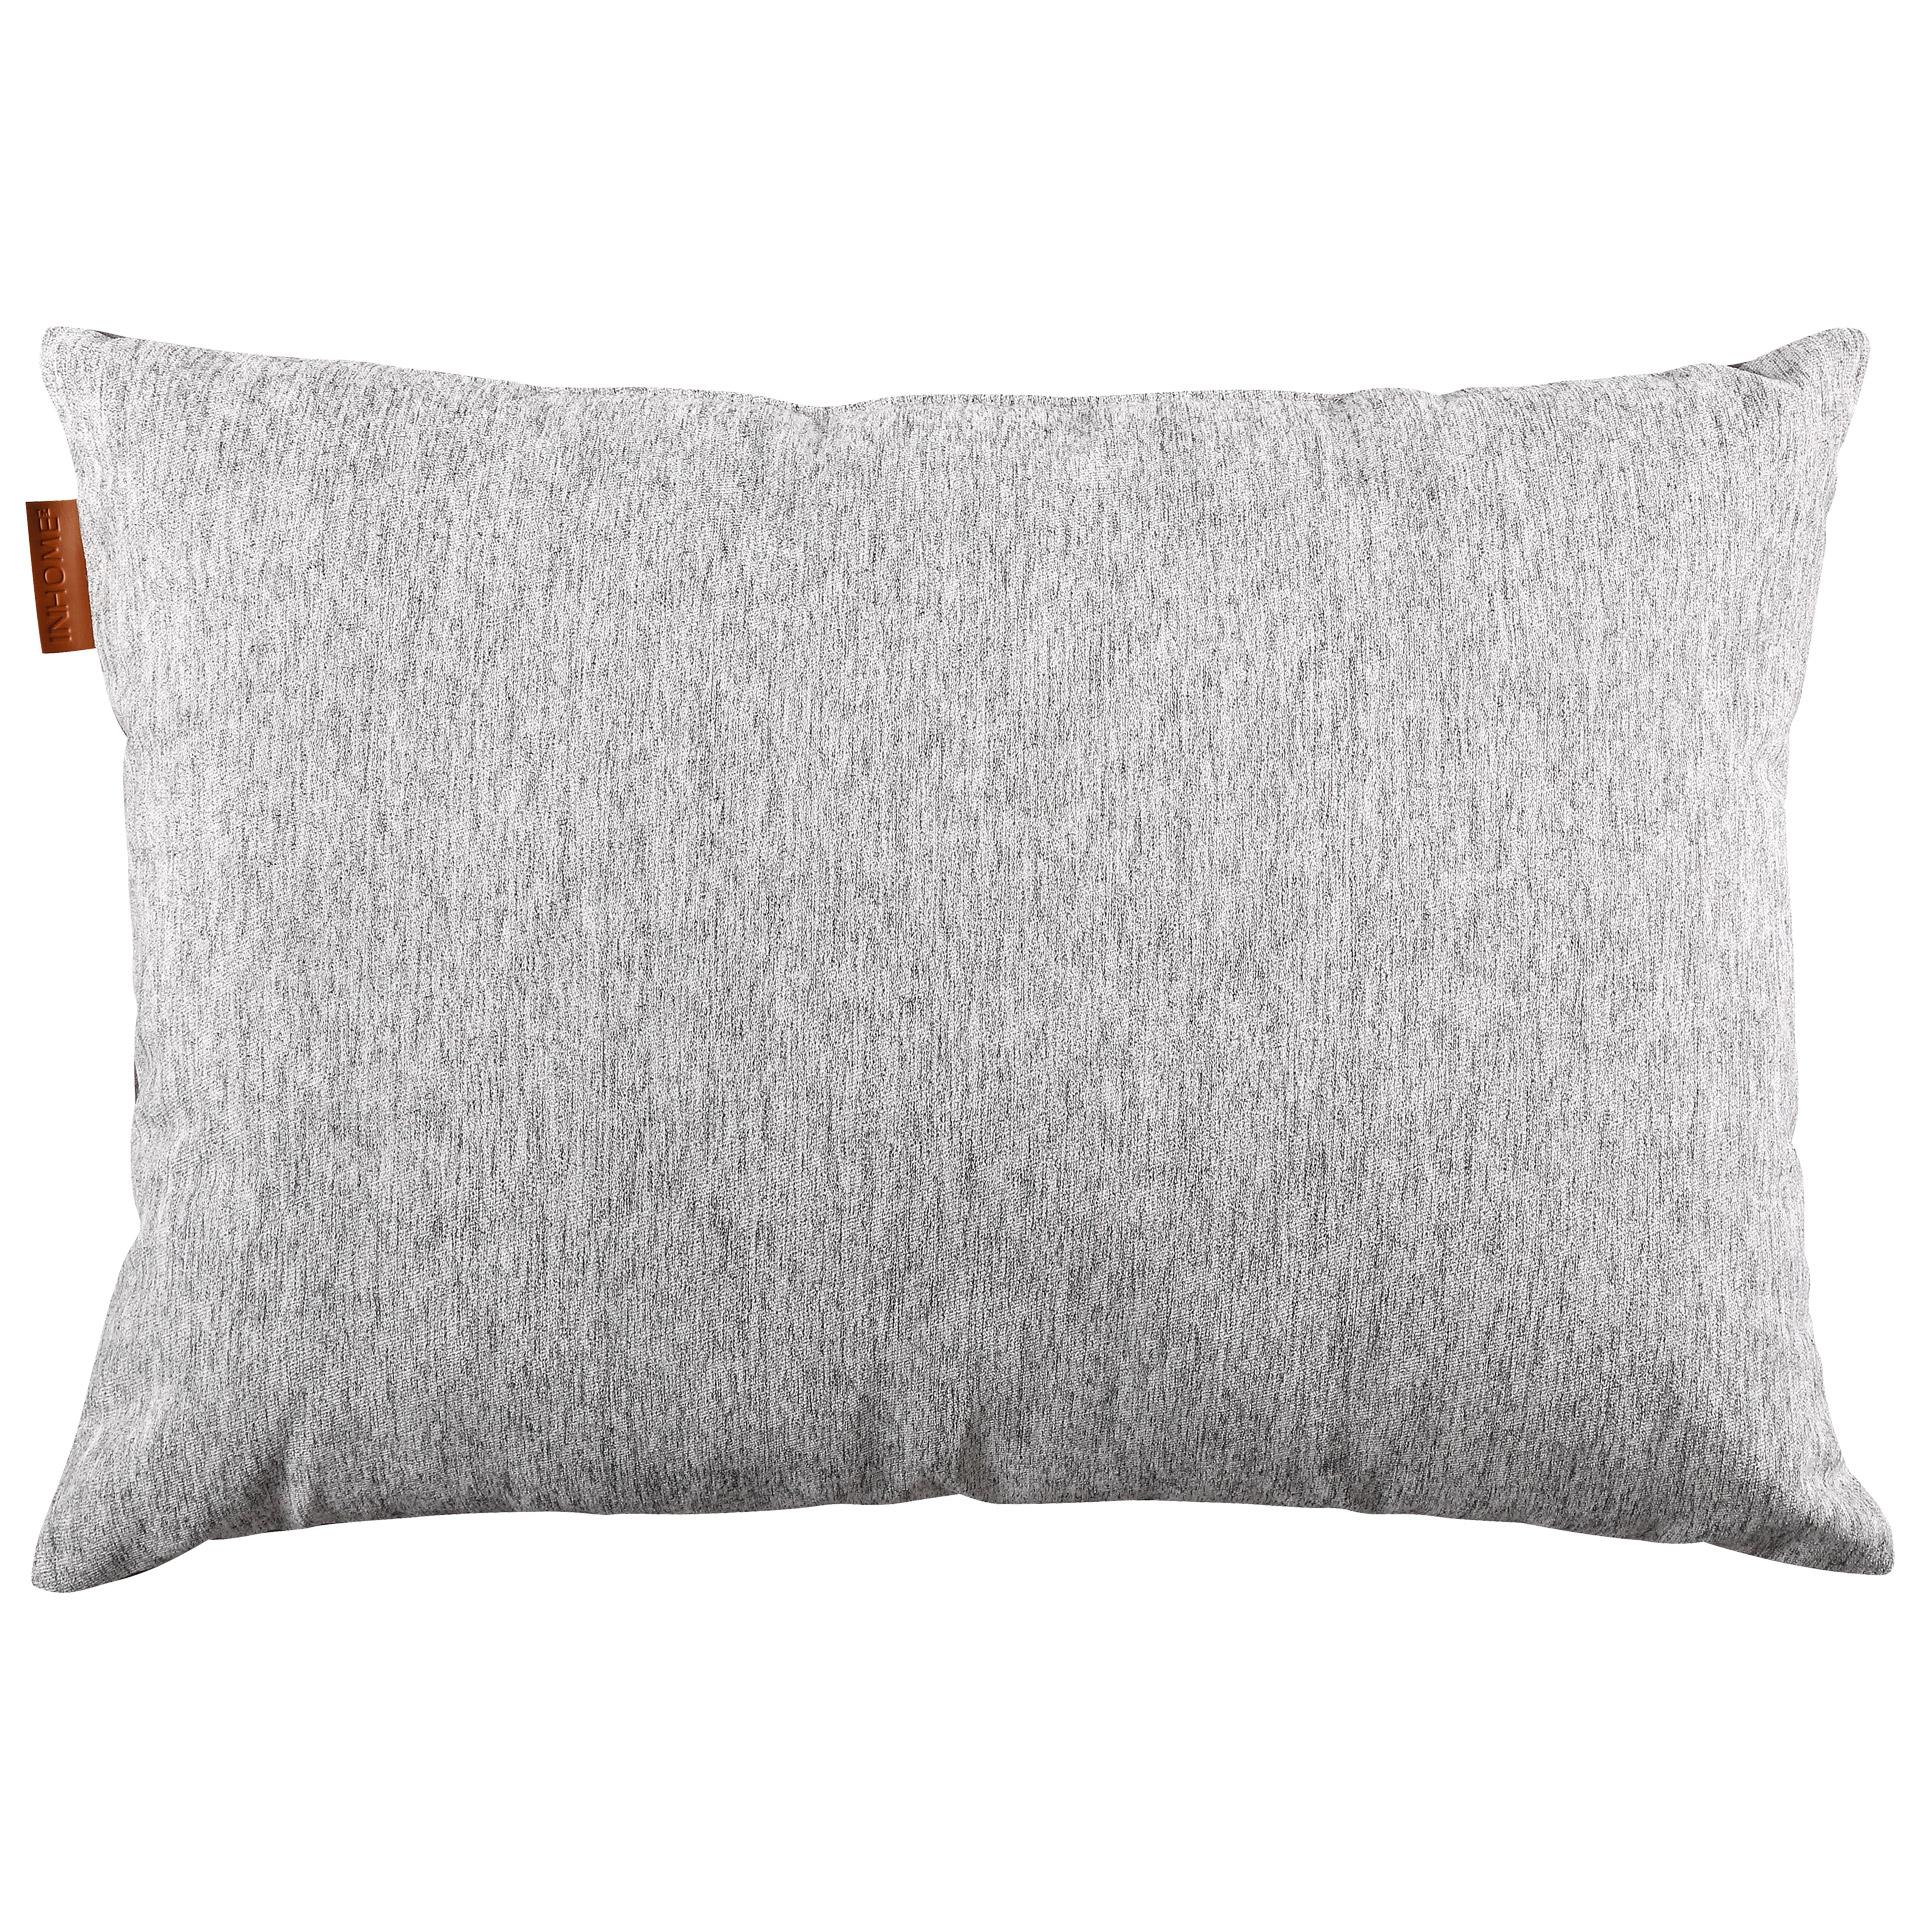 Zierkissen Melange (35x50, grau)